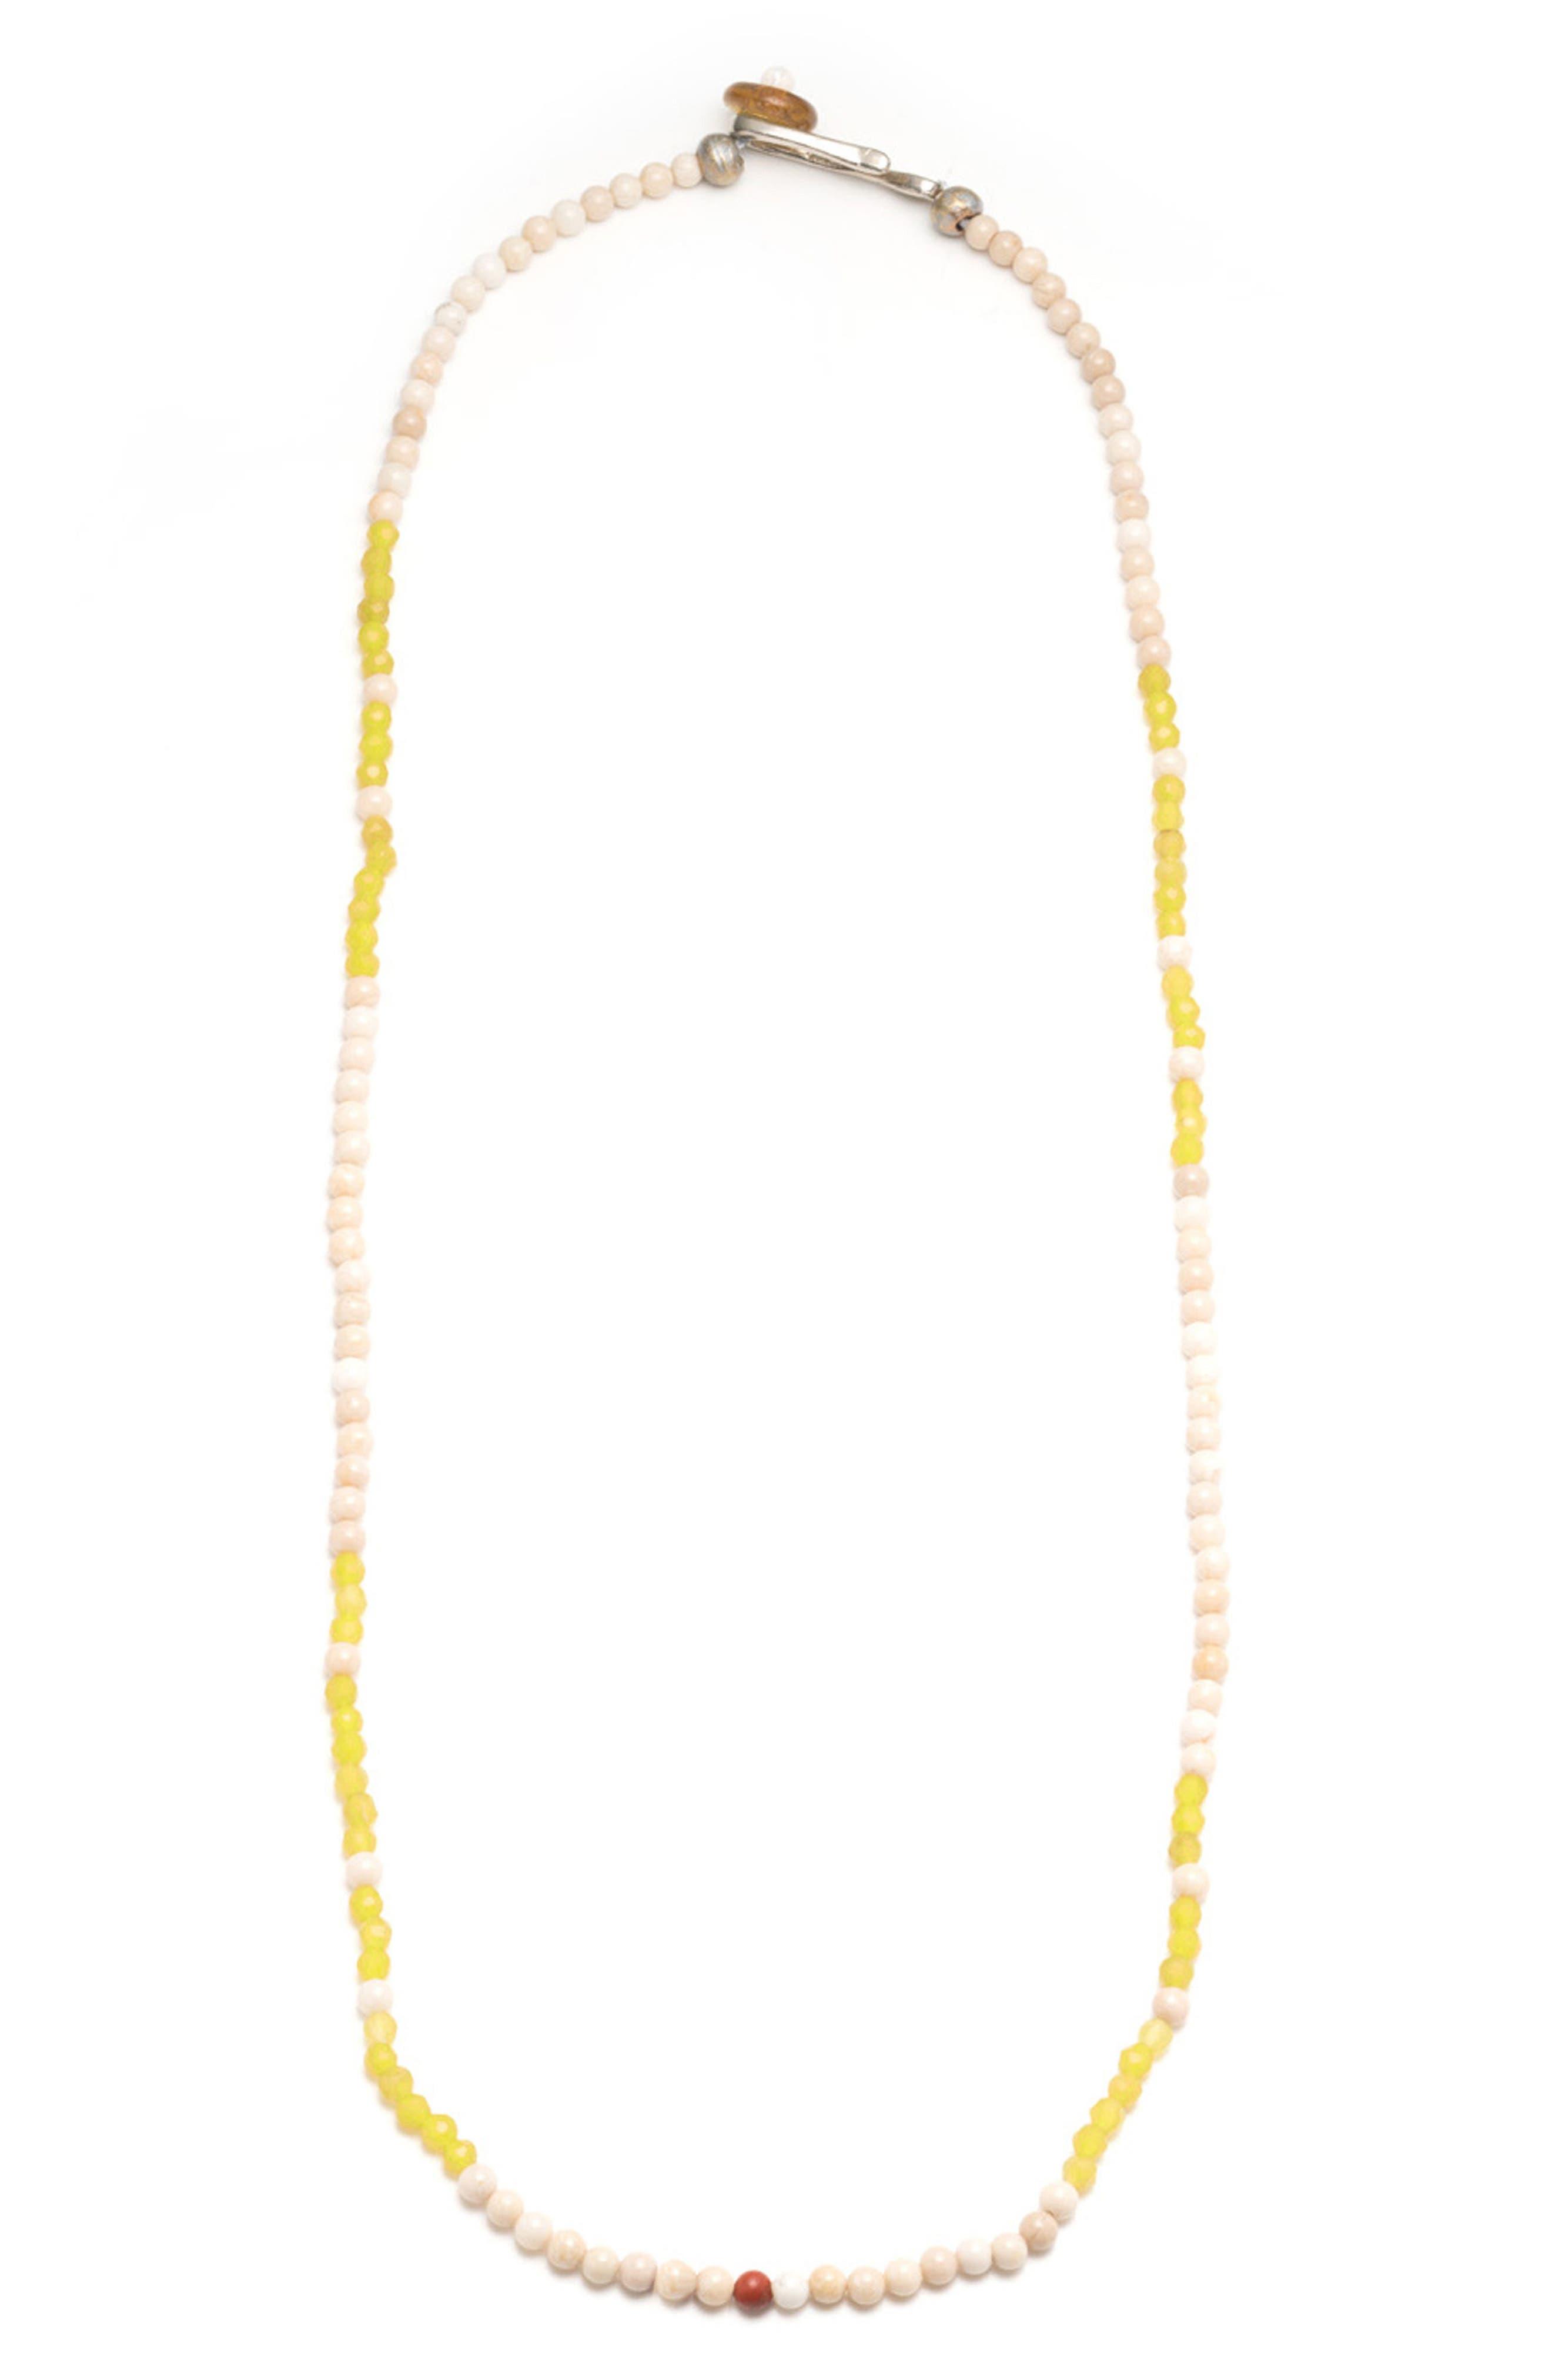 Luck Morse Necklace,                             Main thumbnail 1, color,                             700